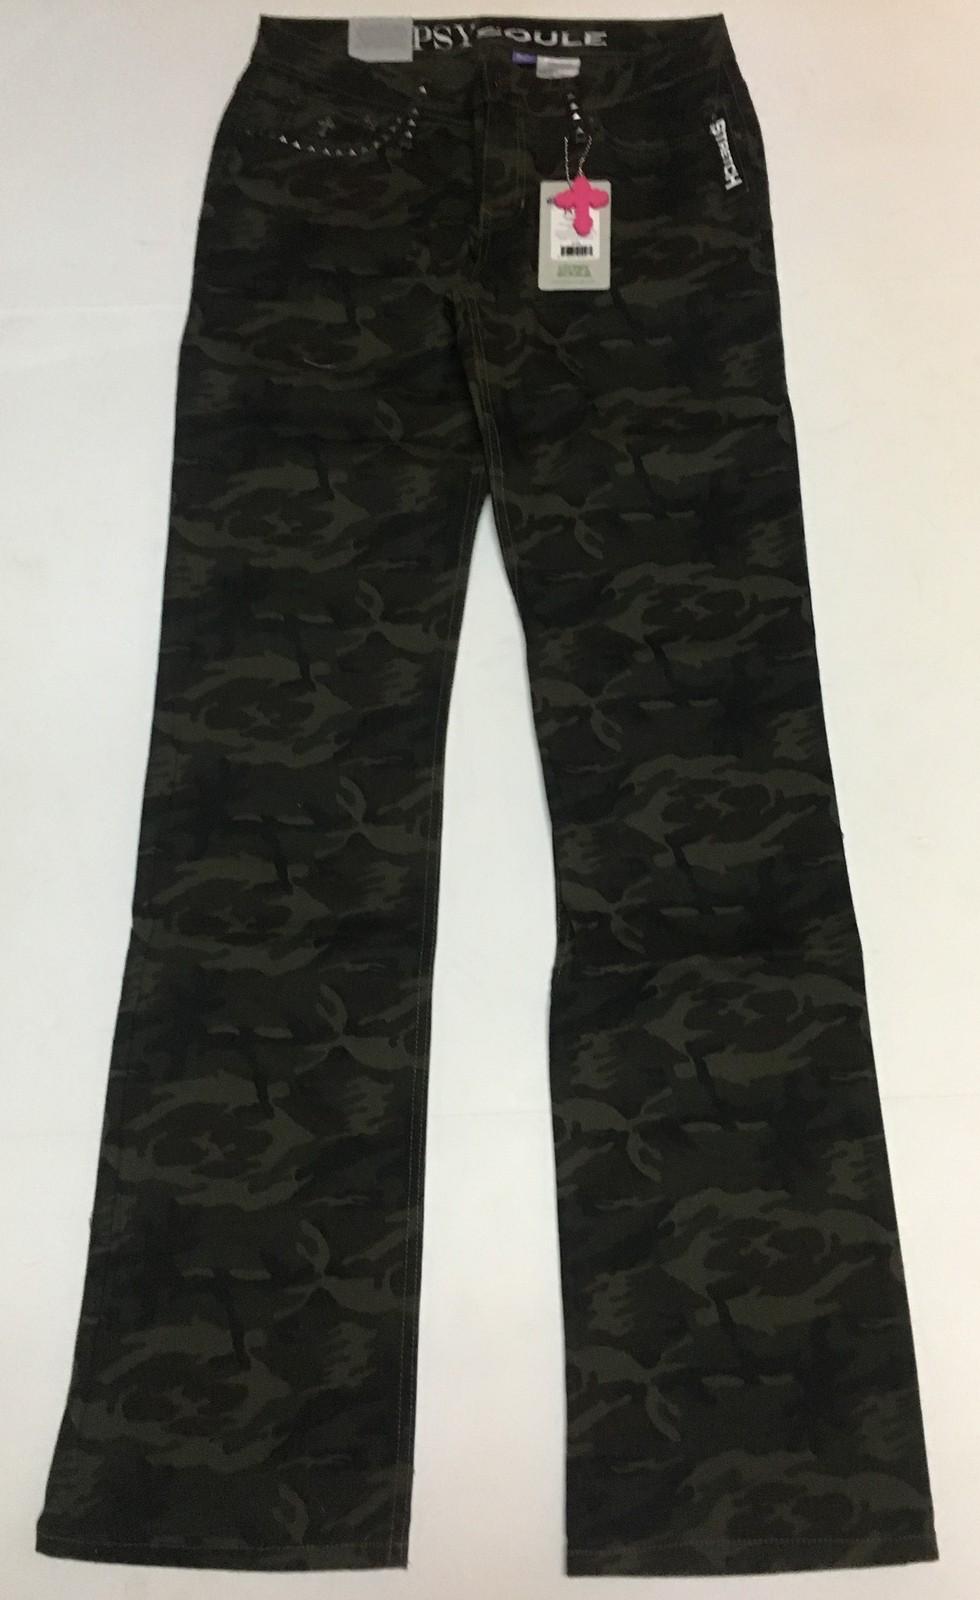 Gypsy Soule Camouflage Pants Jane Sz 6/28 NWT image 4